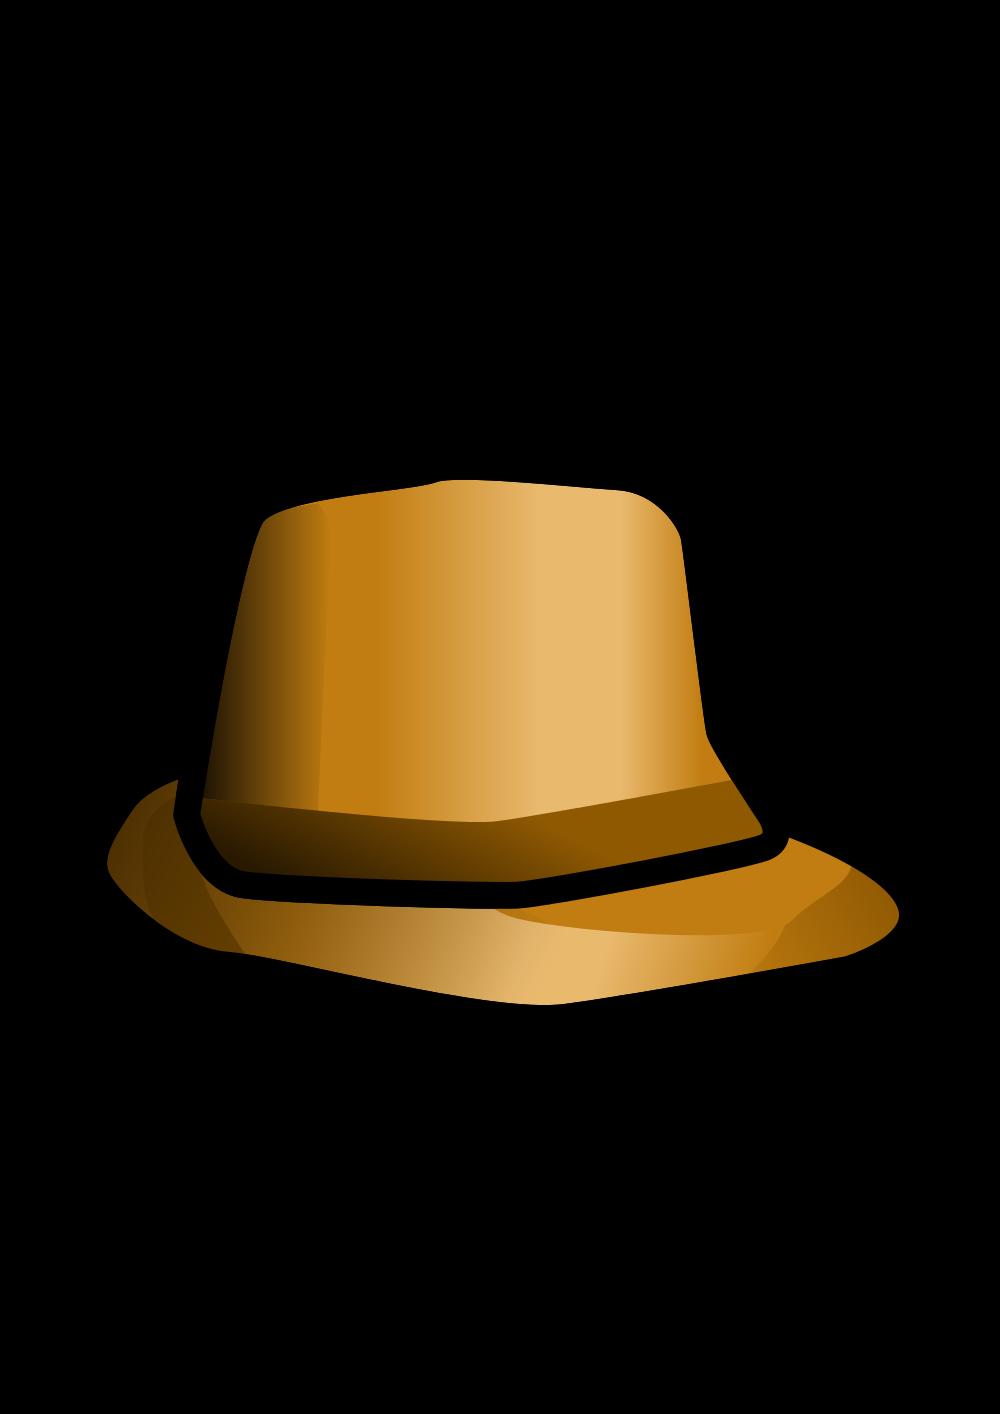 Detective clipart cap. File inspector hat svg